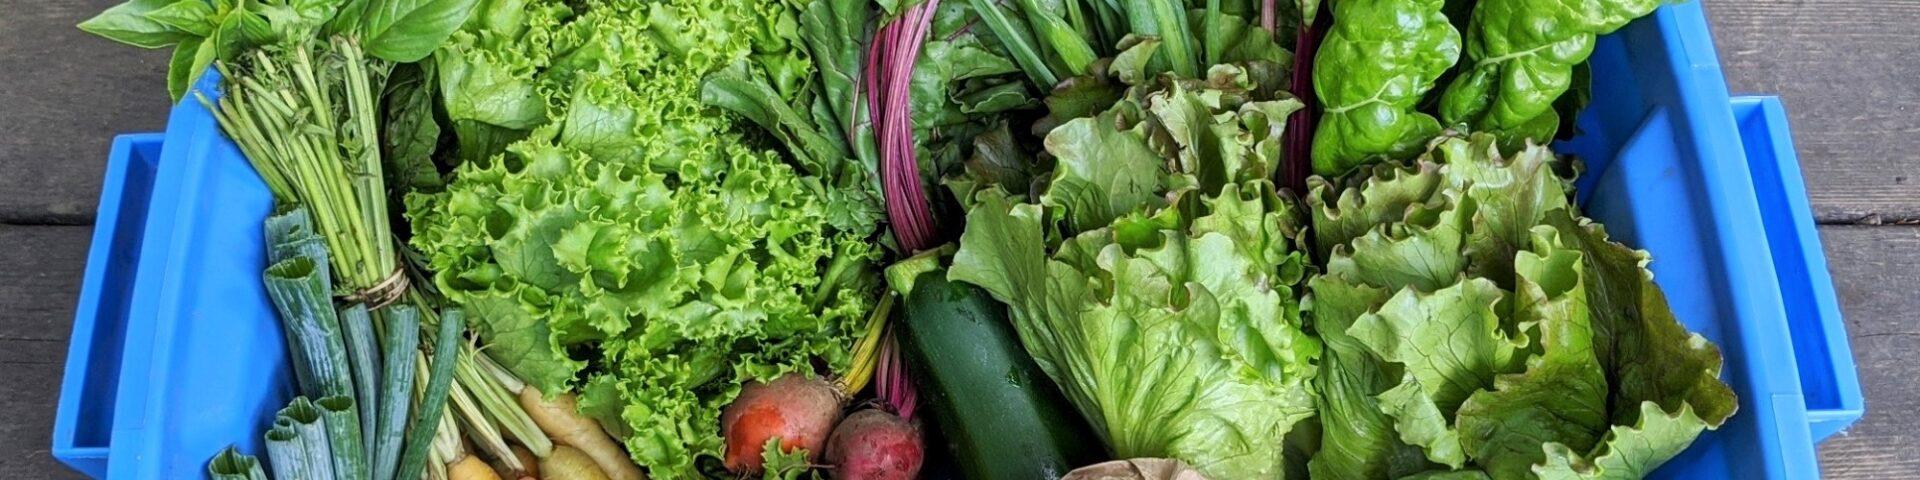 basket of produce from wheel barrow farm